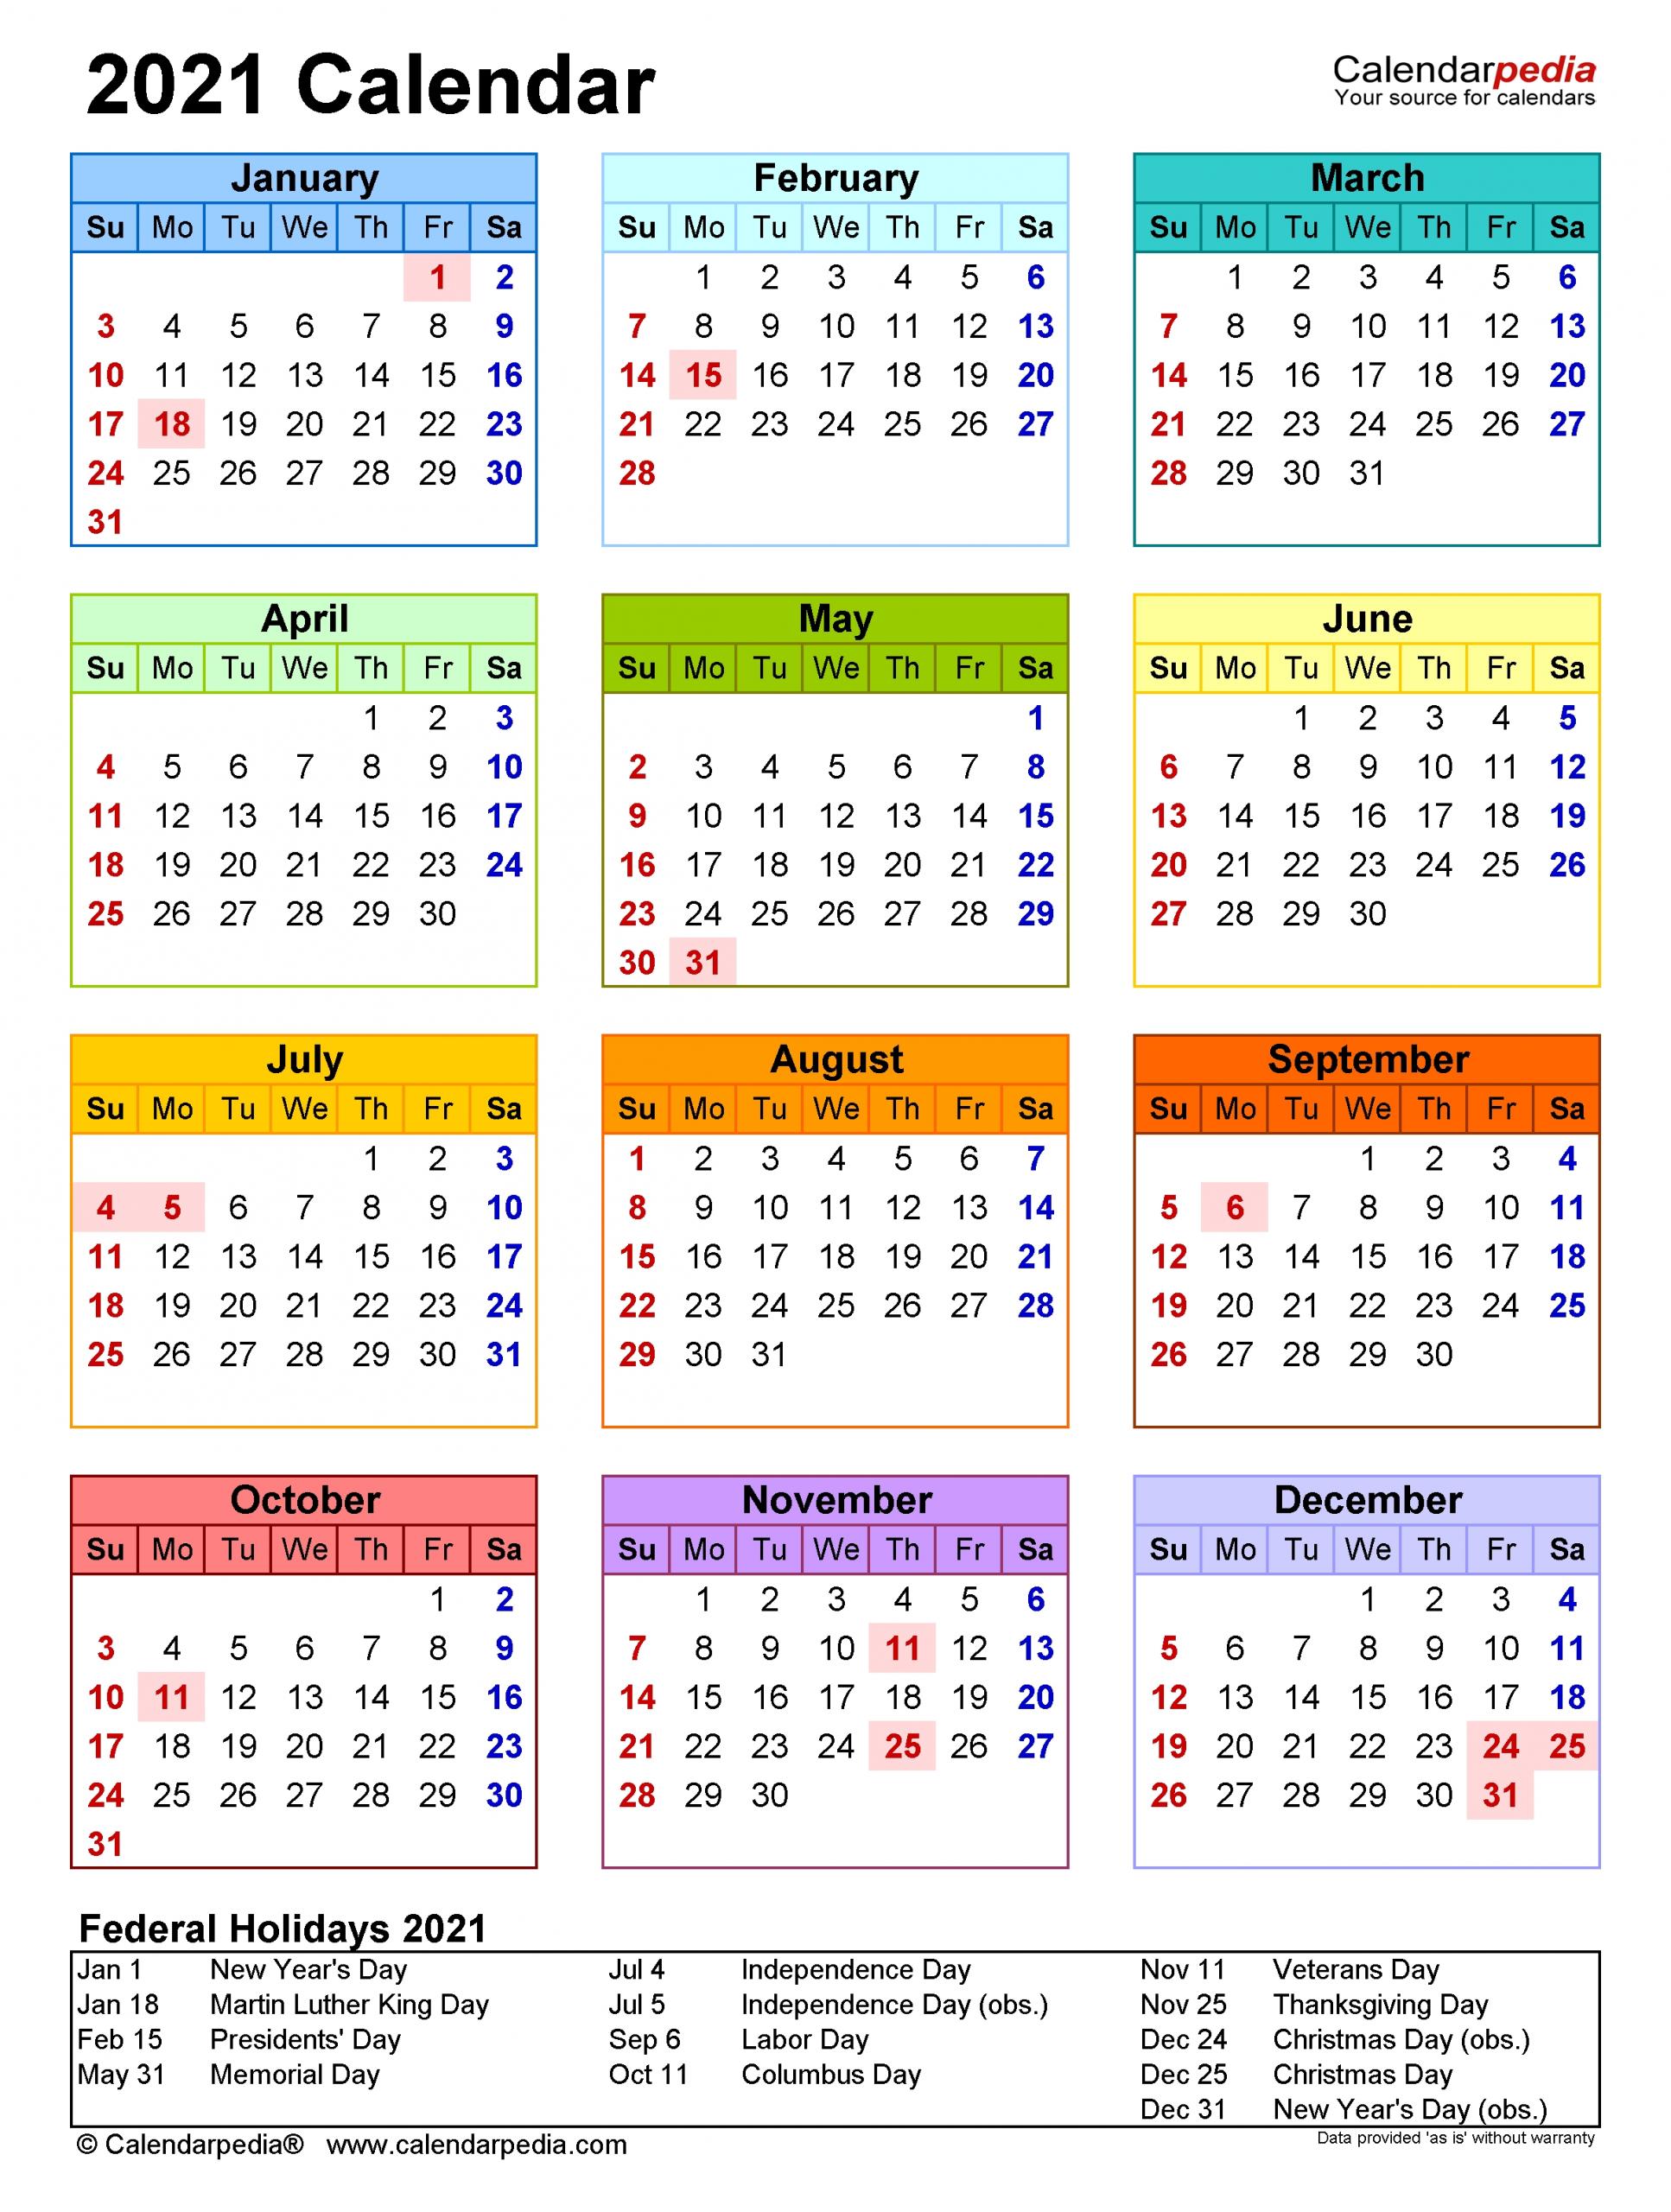 2021 Calendar Holidays And Observances | Printable Calendars 2021 throughout Printable Calendars For 2021